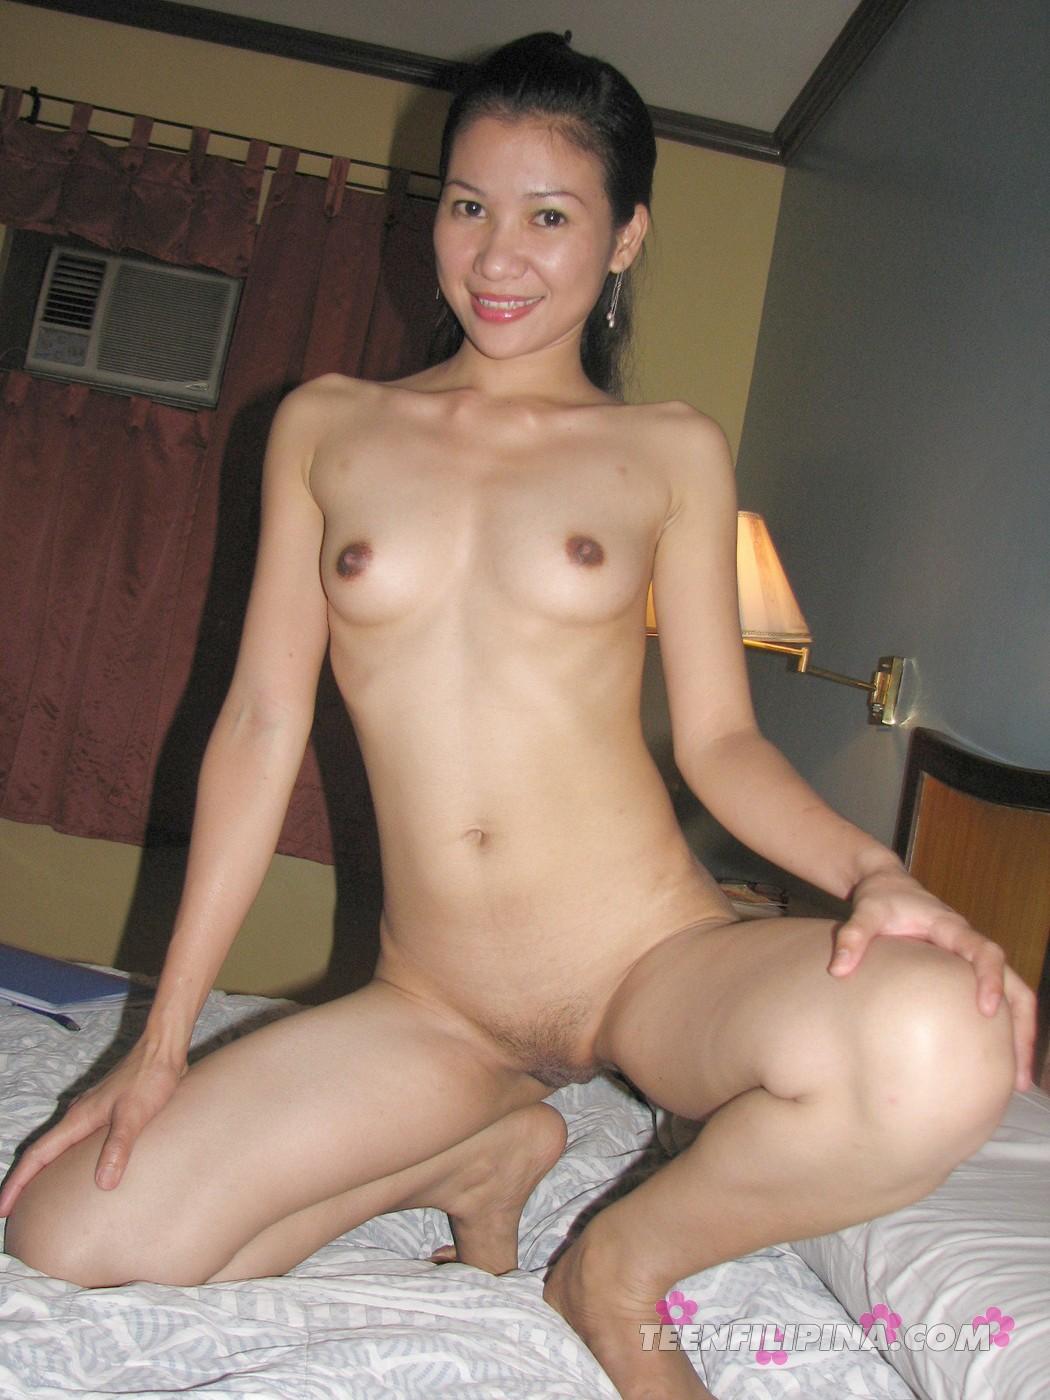 midget girl nude looking young